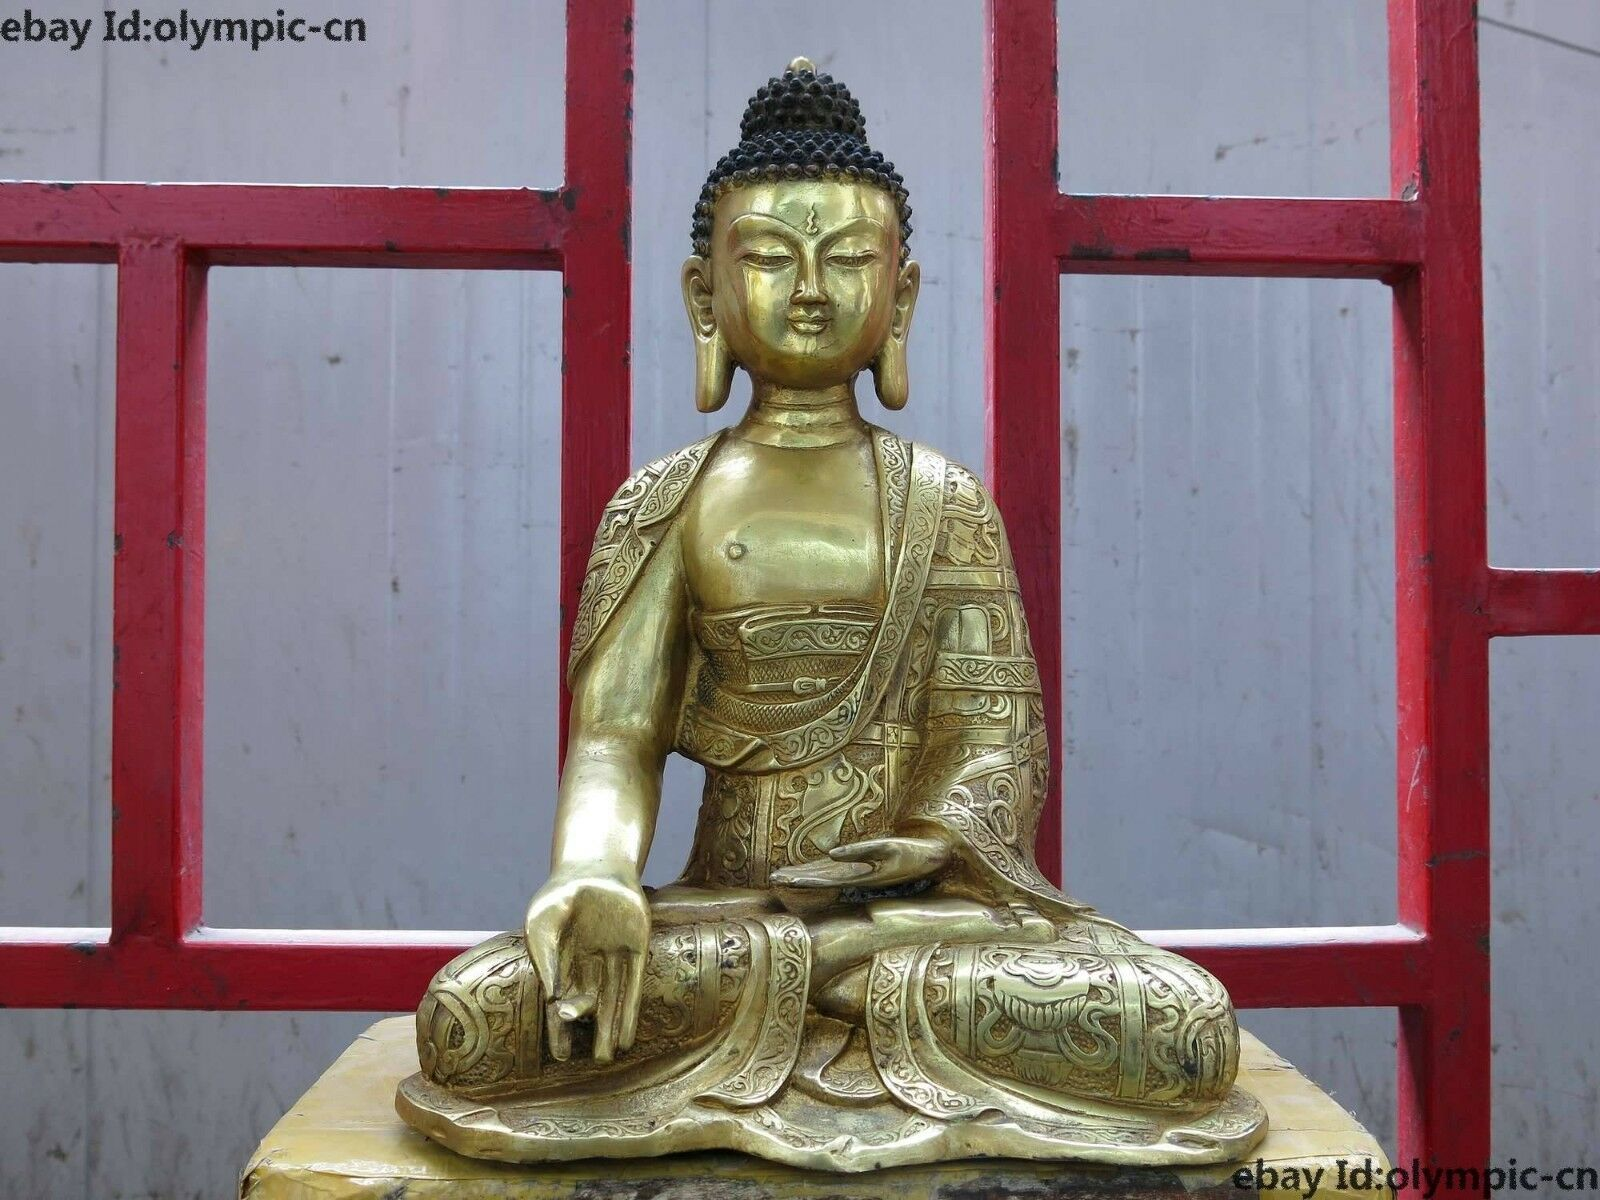 16 China bronze gild carved eight treasures buddhism Shakyamuni buddha Statue16 China bronze gild carved eight treasures buddhism Shakyamuni buddha Statue